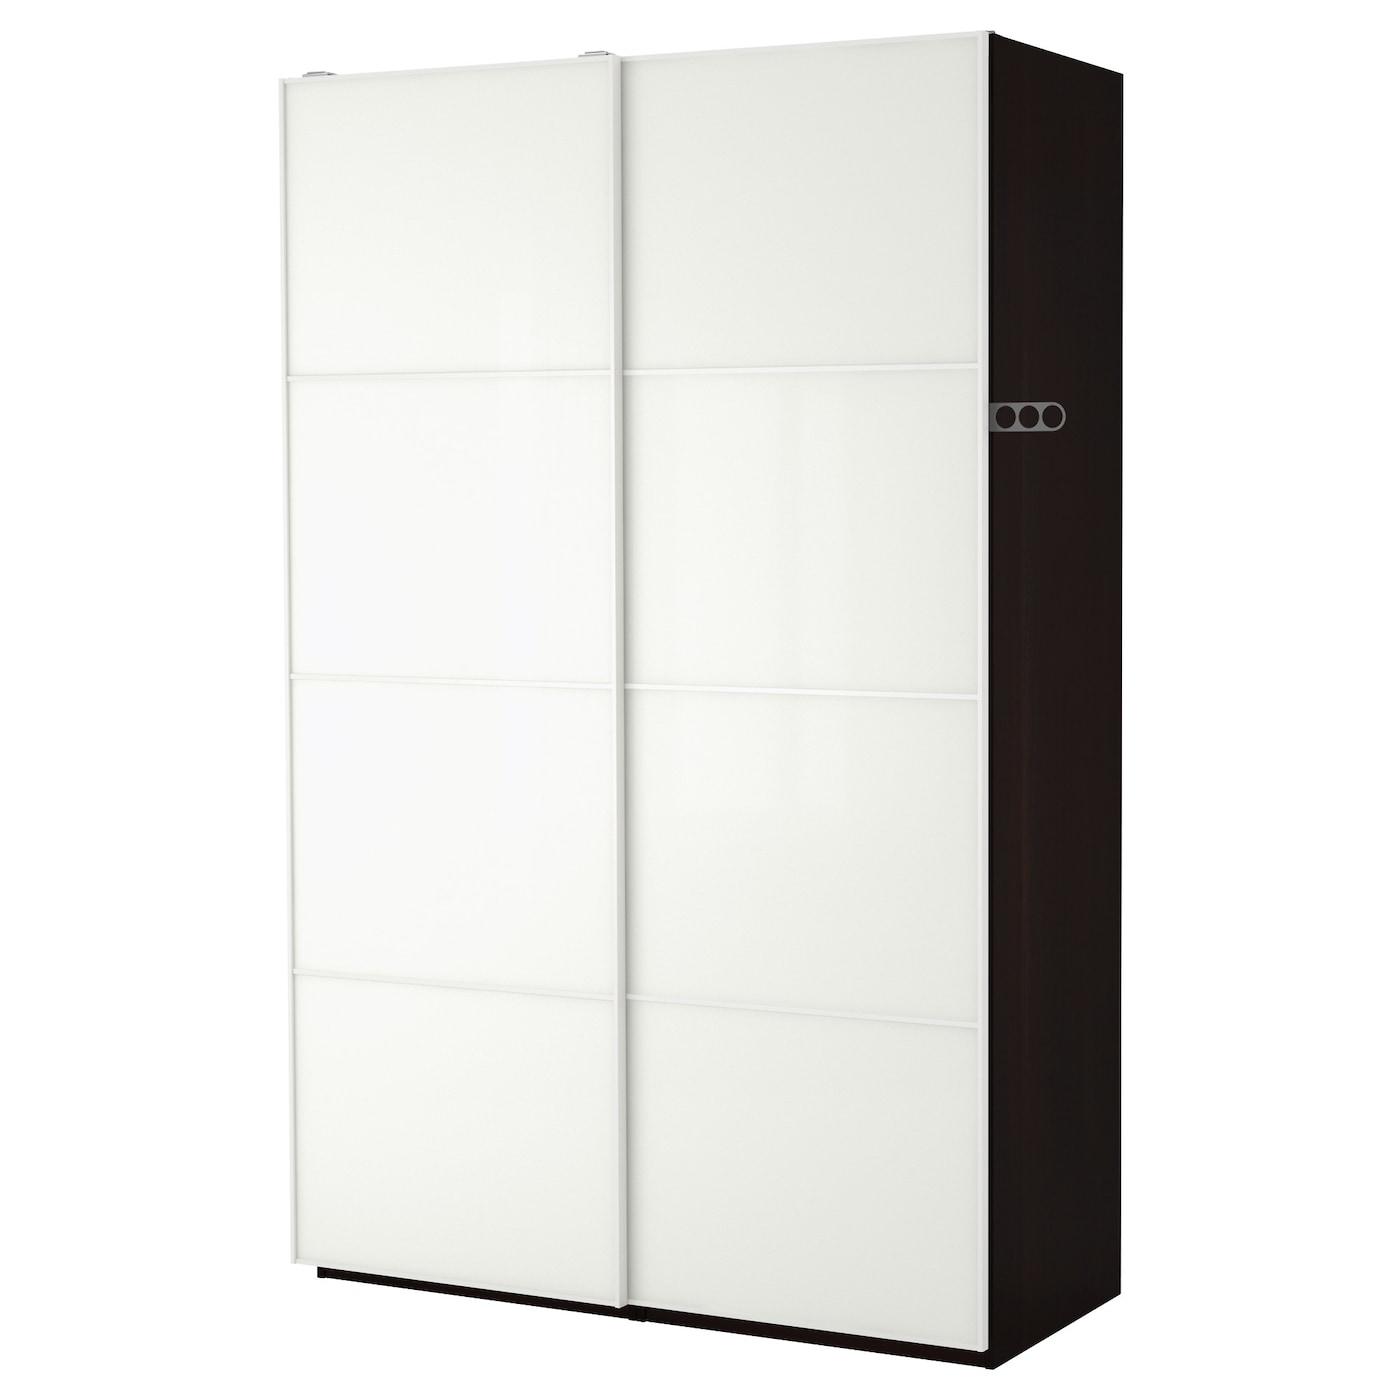 pax wardrobe black brown f rvik white glass 150x66x201 cm ikea. Black Bedroom Furniture Sets. Home Design Ideas